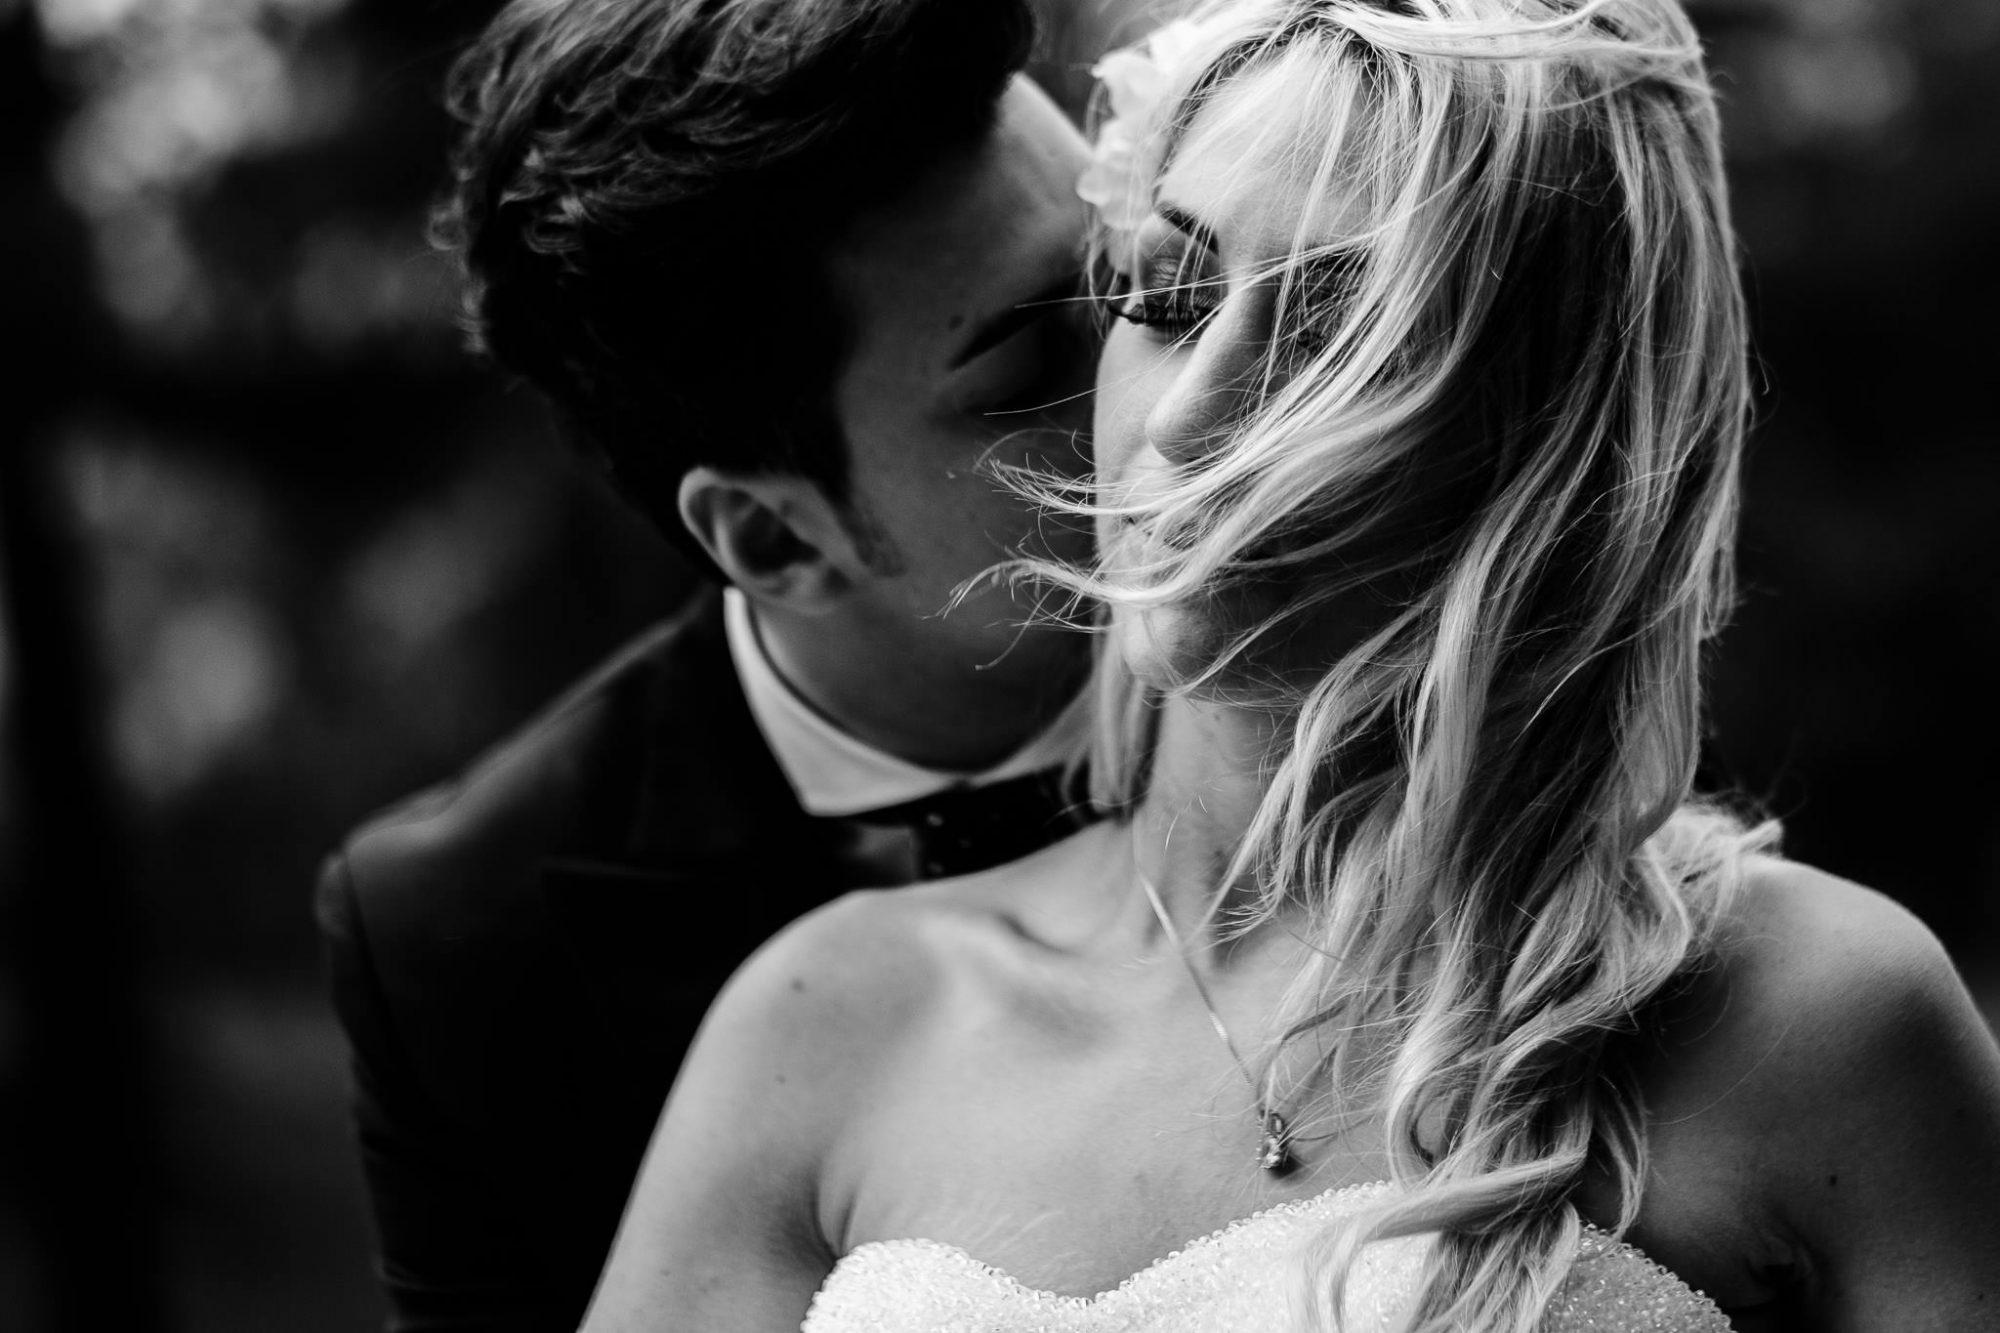 fotografo-reportage-matrimoni-luca-rossi